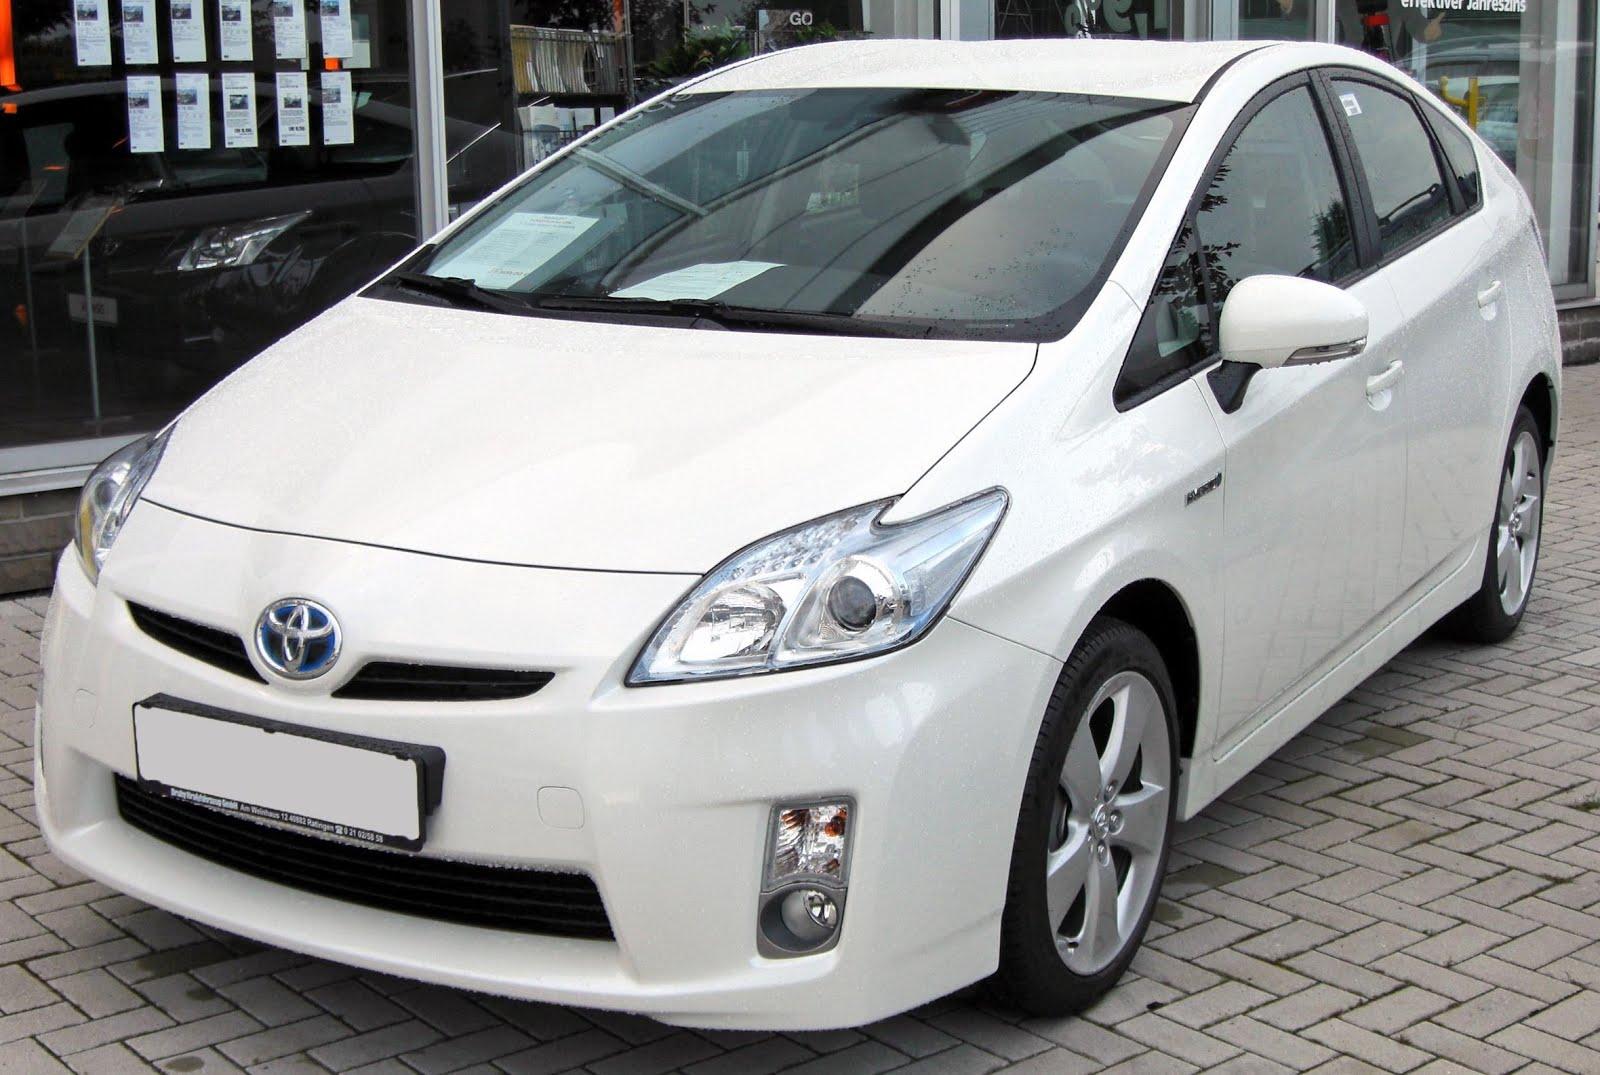 Discussão - Perguntas/Opiniões etc sobre veículos - Página 3 Toyota_Prius_III_20090710_front